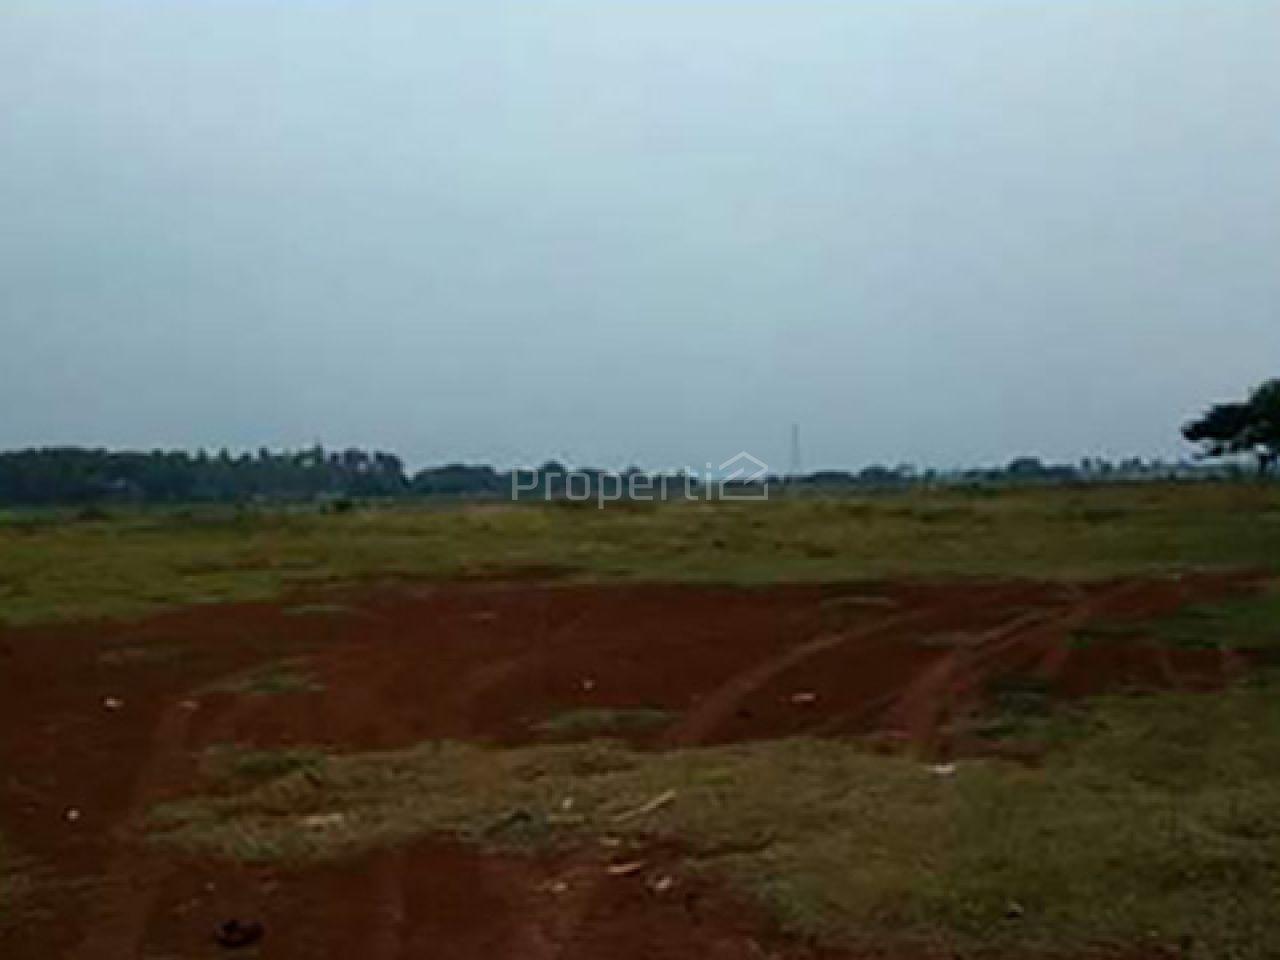 Tanah Darat dan Datar di Mauk, Tangerang, Mauk